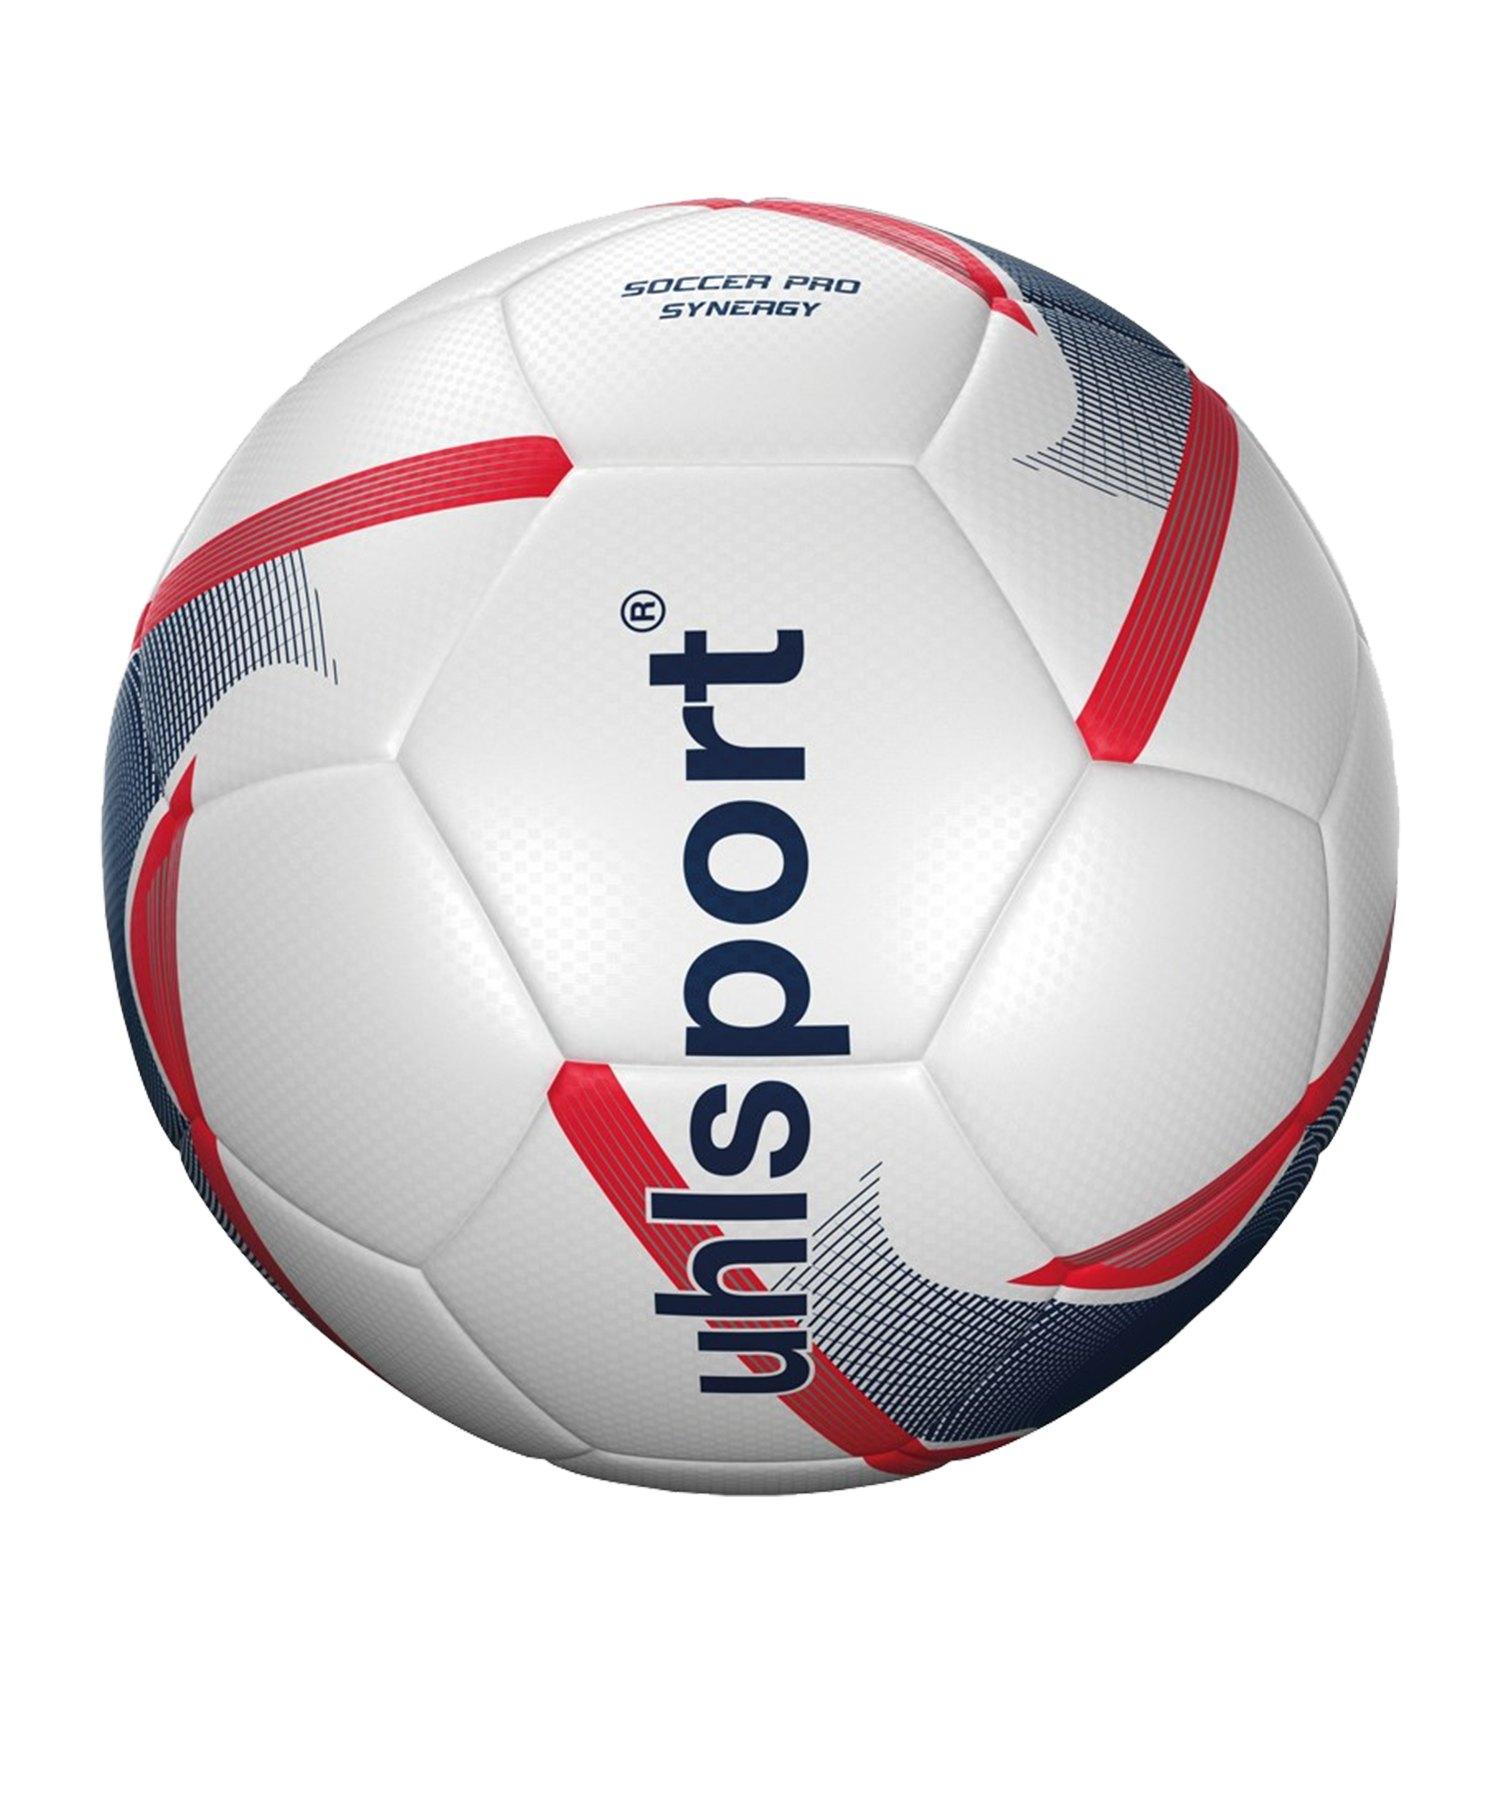 Uhlsport Infinity Pro Training Fussball Weiss F01 - weiss